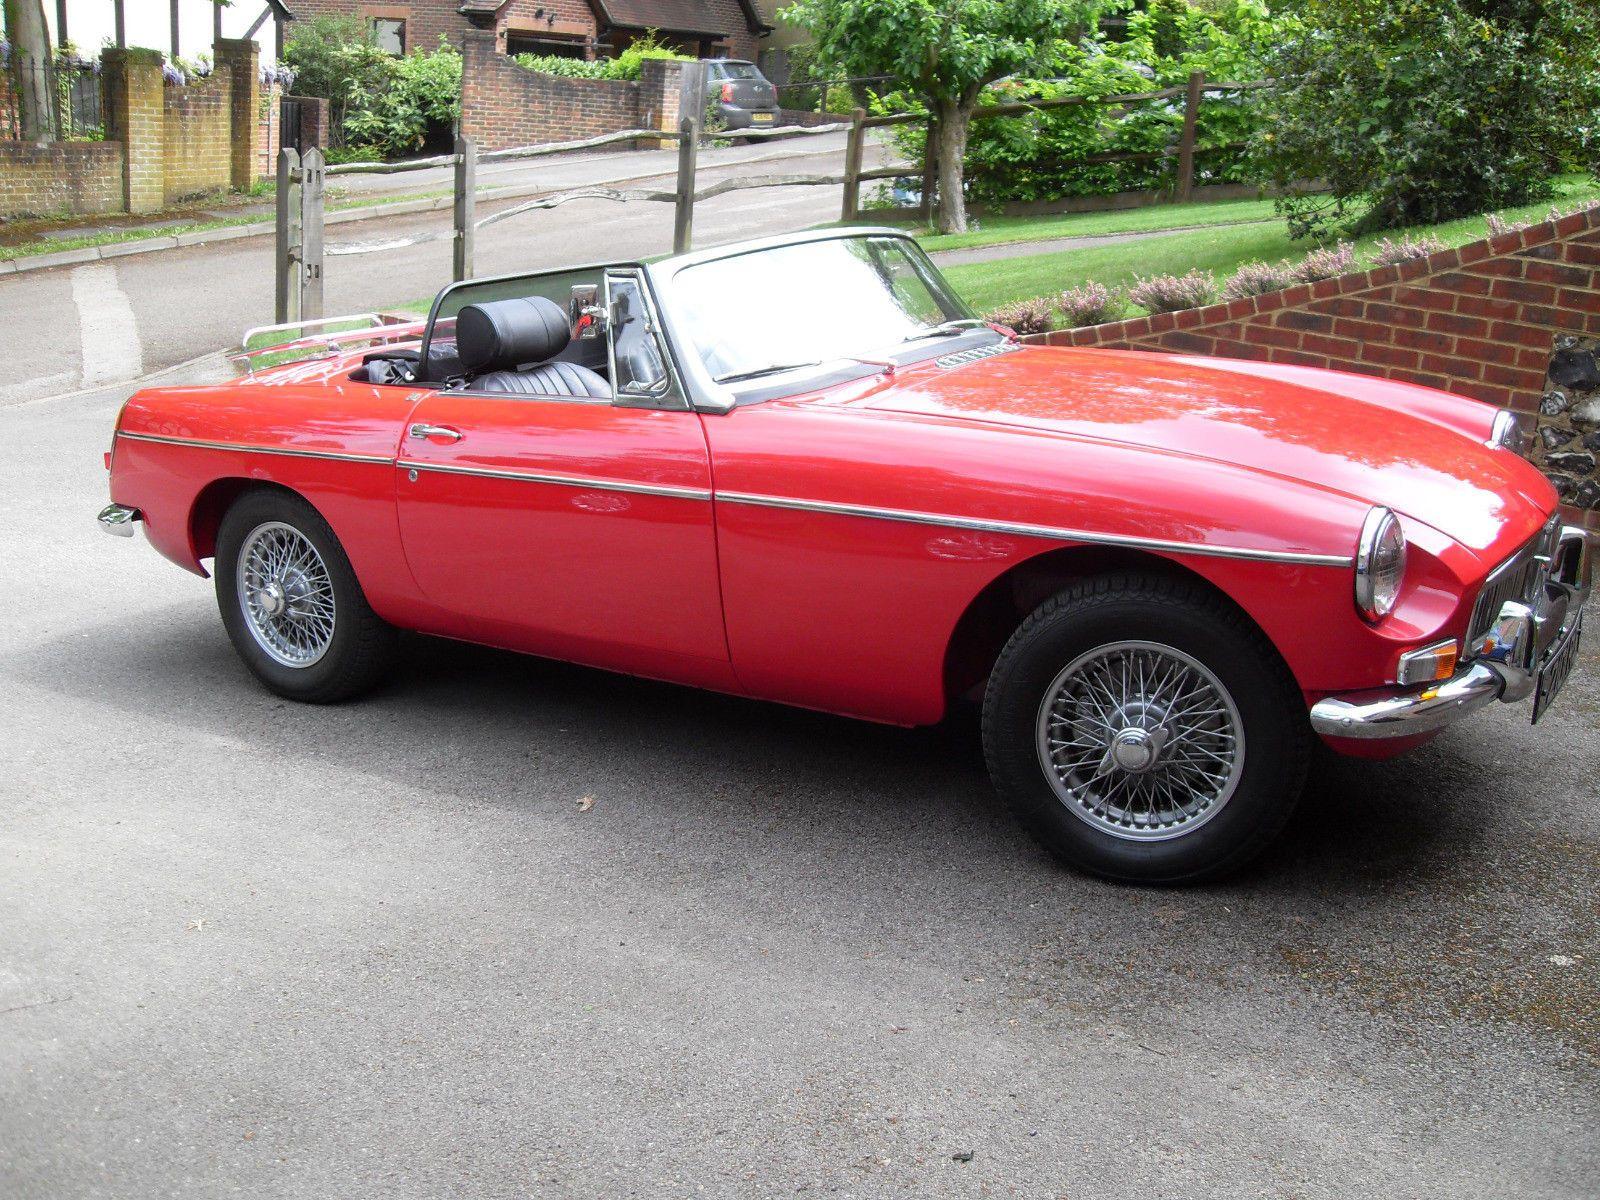 Ebay Mgb Roadster Mark 1 1964 Beautiful Car Red Stunning Cars 1960s Beautiful Cars Roadsters Car